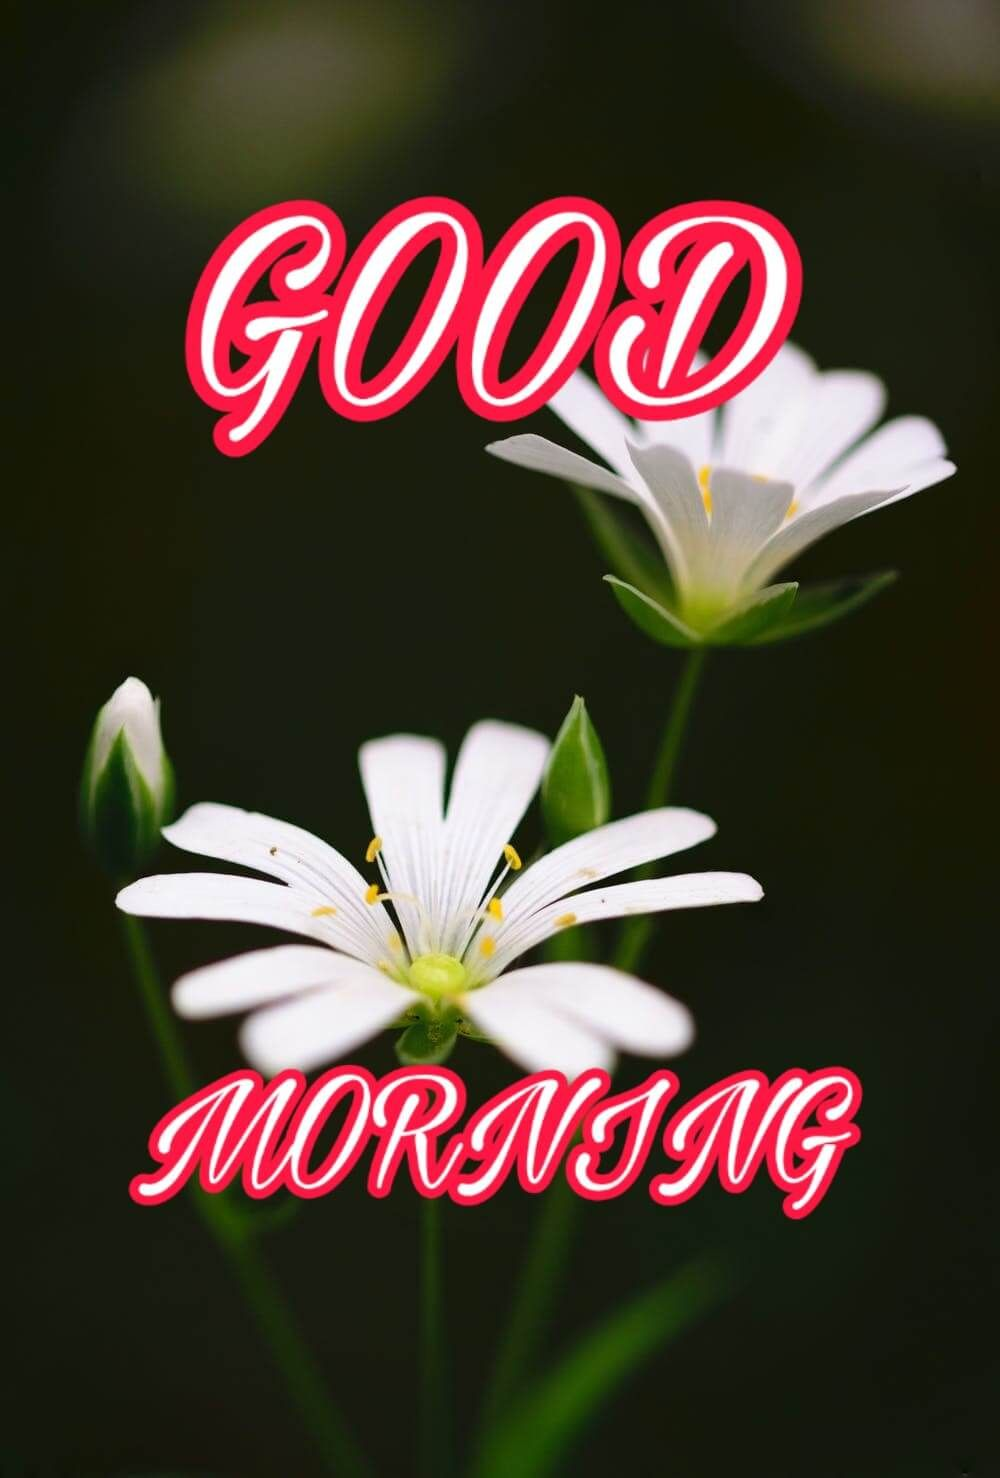 Hello Good Morning Images Download Pestcare Jakarta